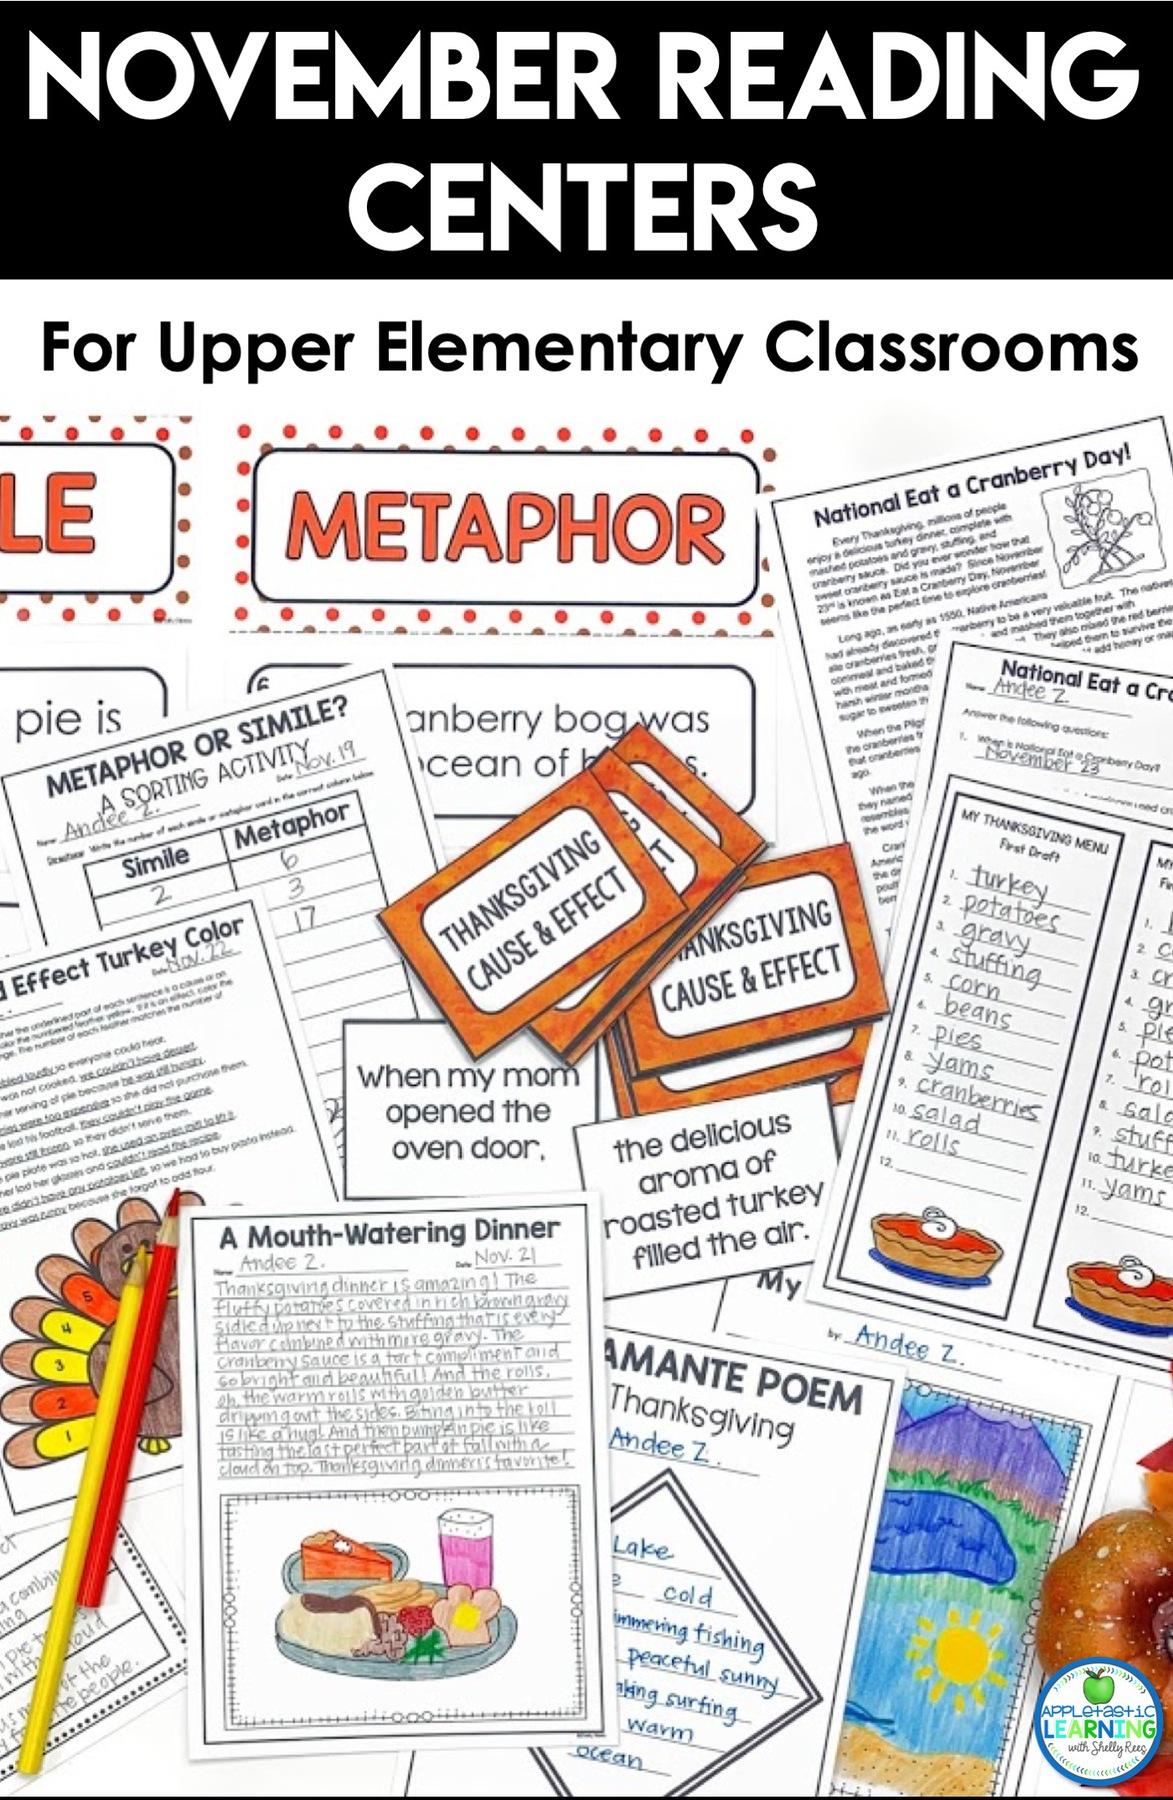 November reading activities for upper elementary classroom